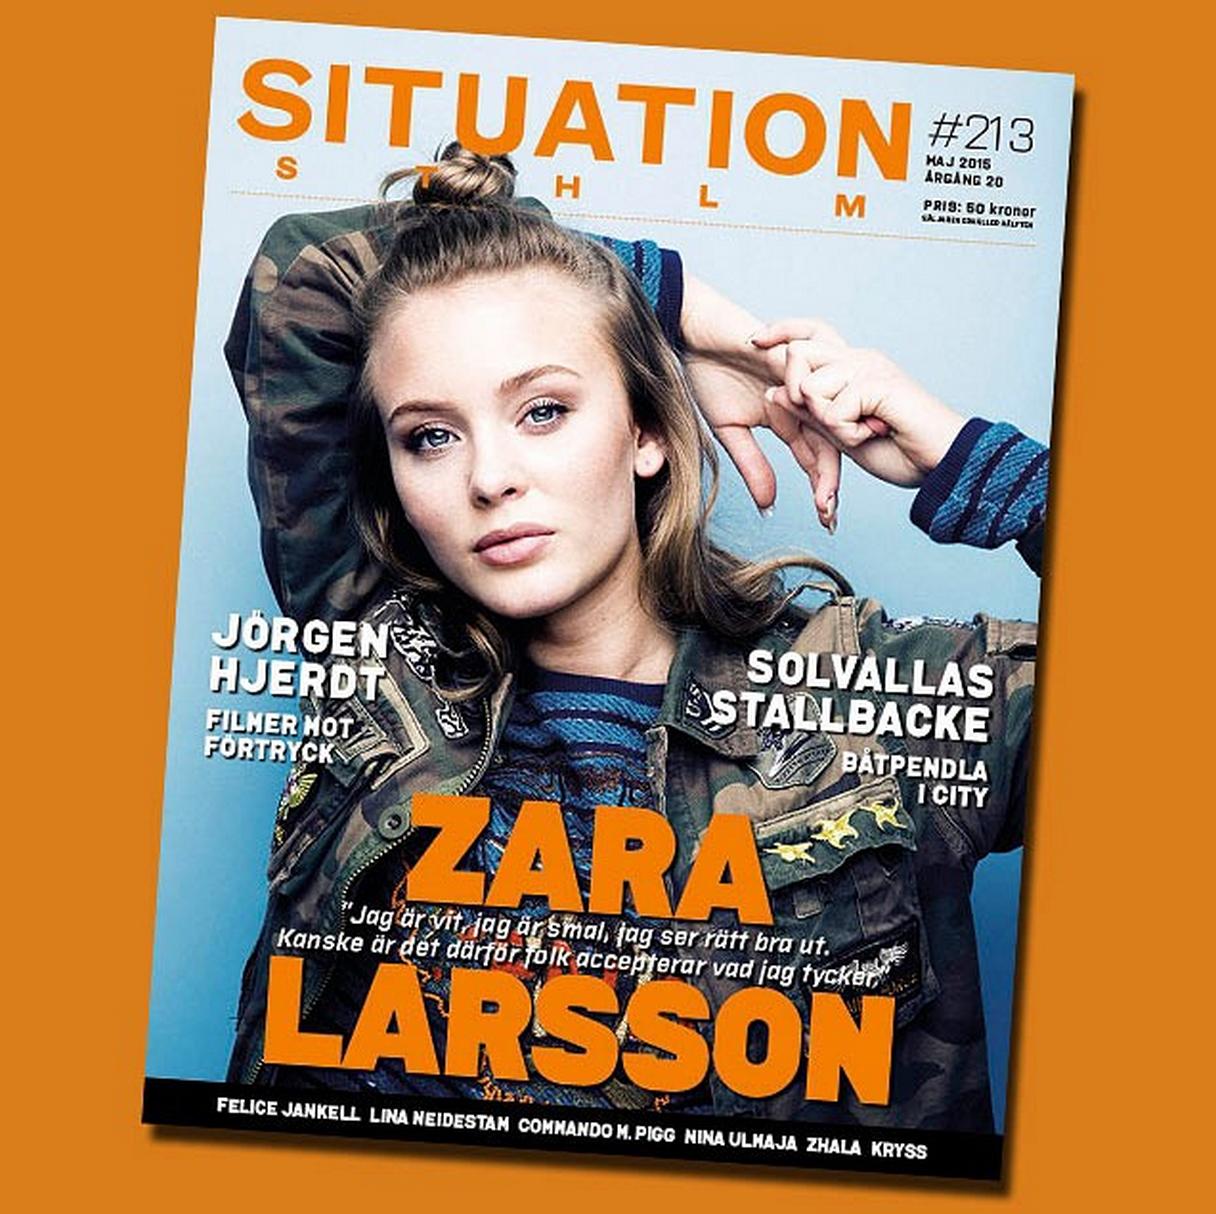 Situation Sthlm, Intervju, Befriad, Jörgen Hjerdt